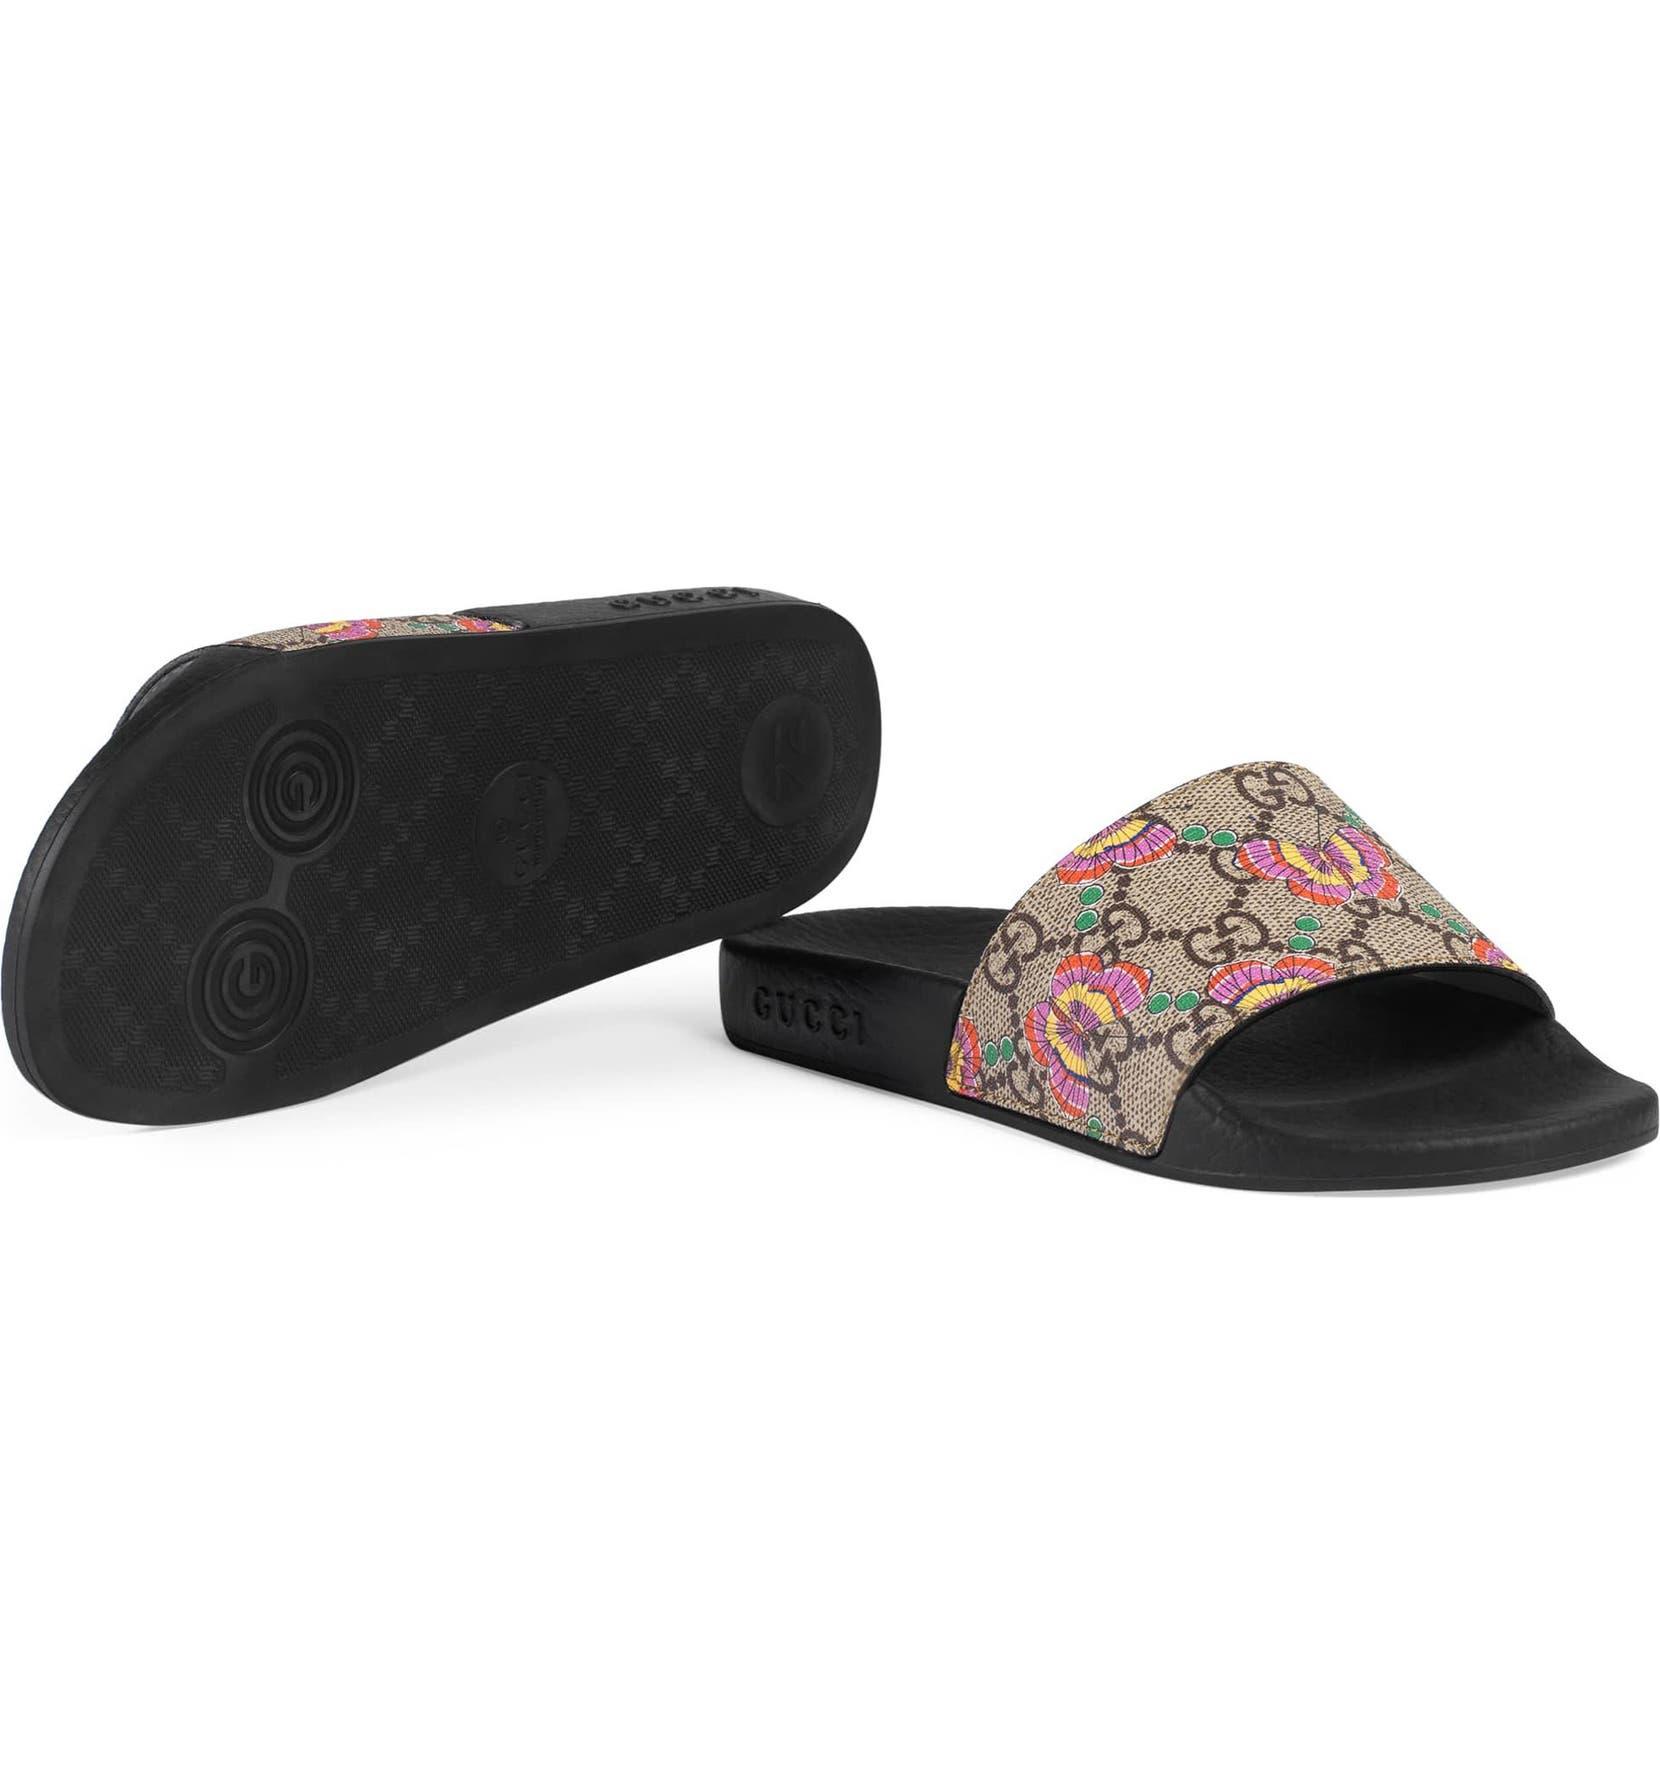 07ee07cdaed39 Gucci GG Supreme Butterfly Slide Sandal (Toddler   Little Kid ...